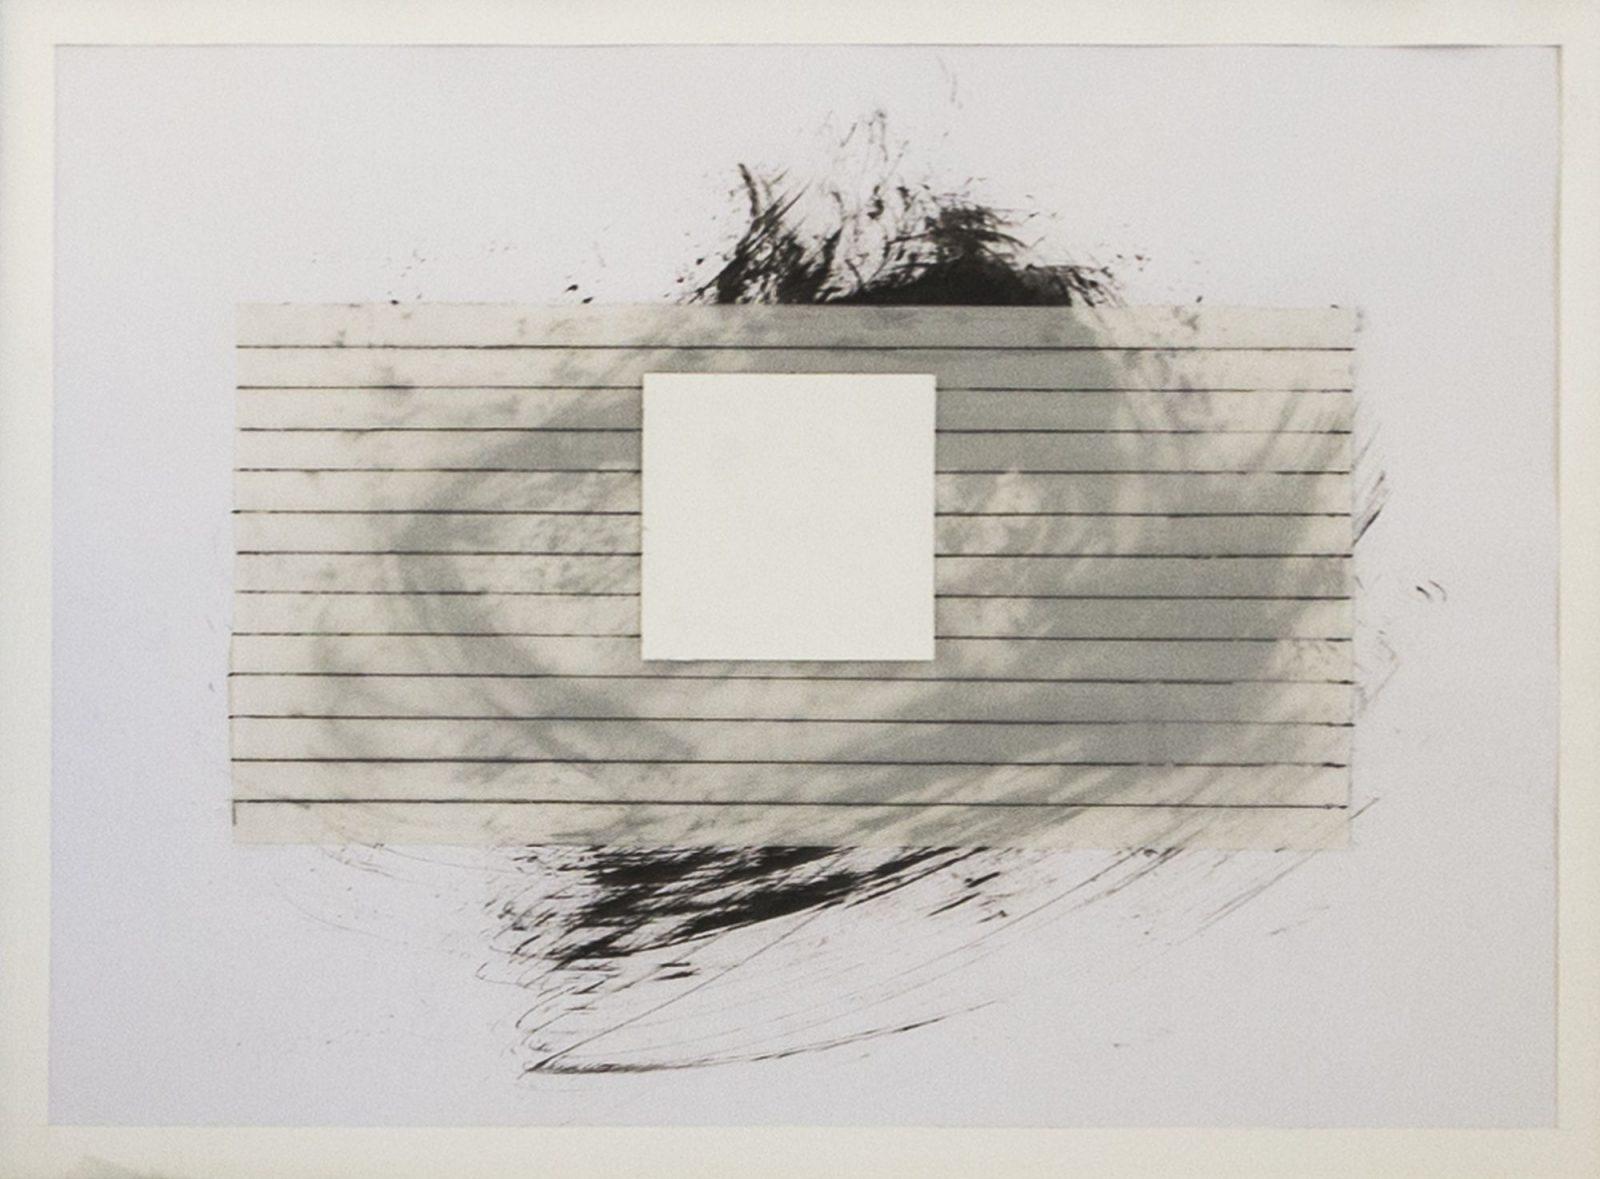 Roland Kazi: Hided Scenery